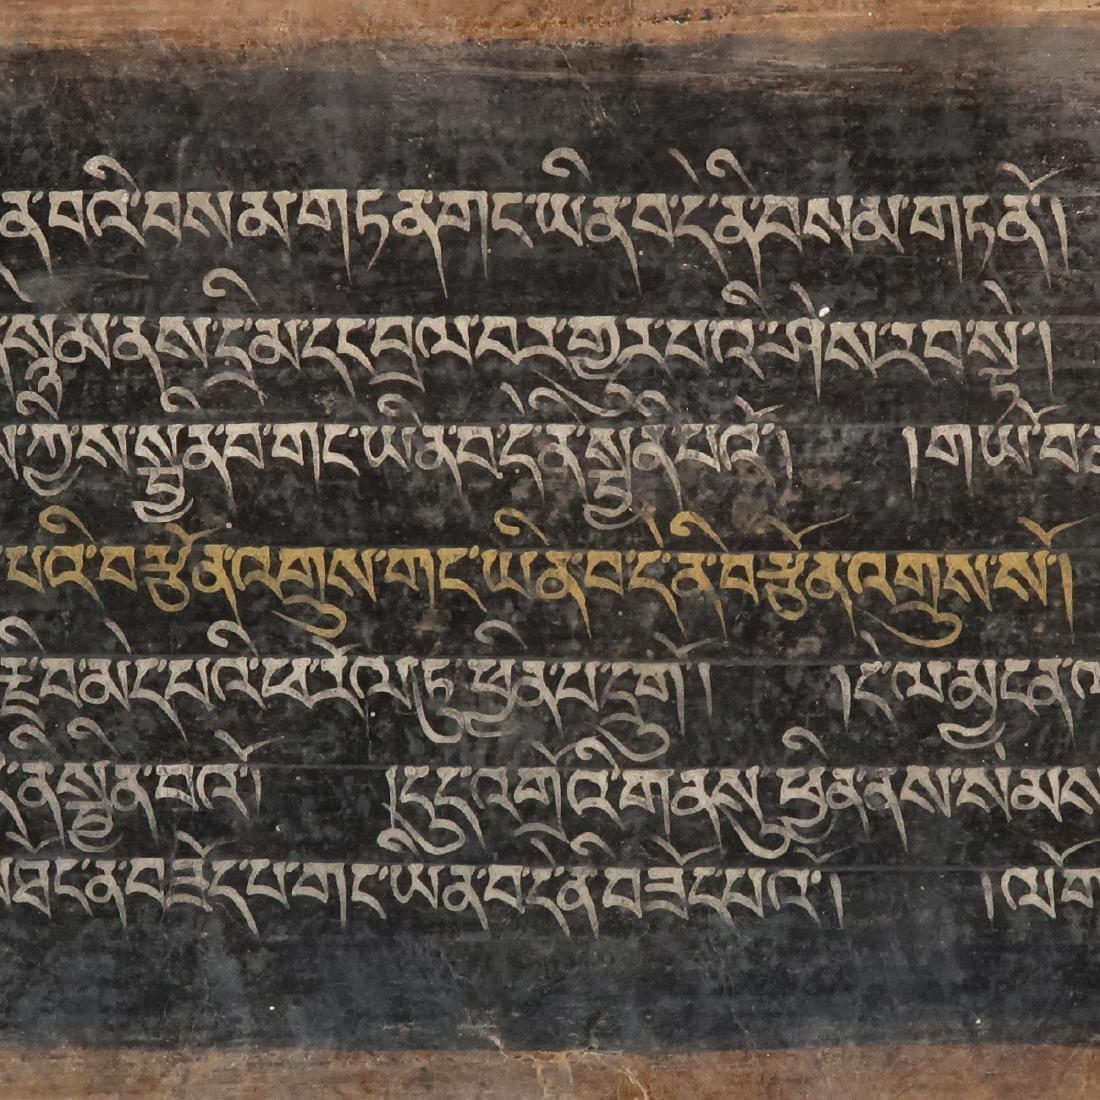 Tibetan Sutra Manuscript, c. 17th Century A.D. - 3